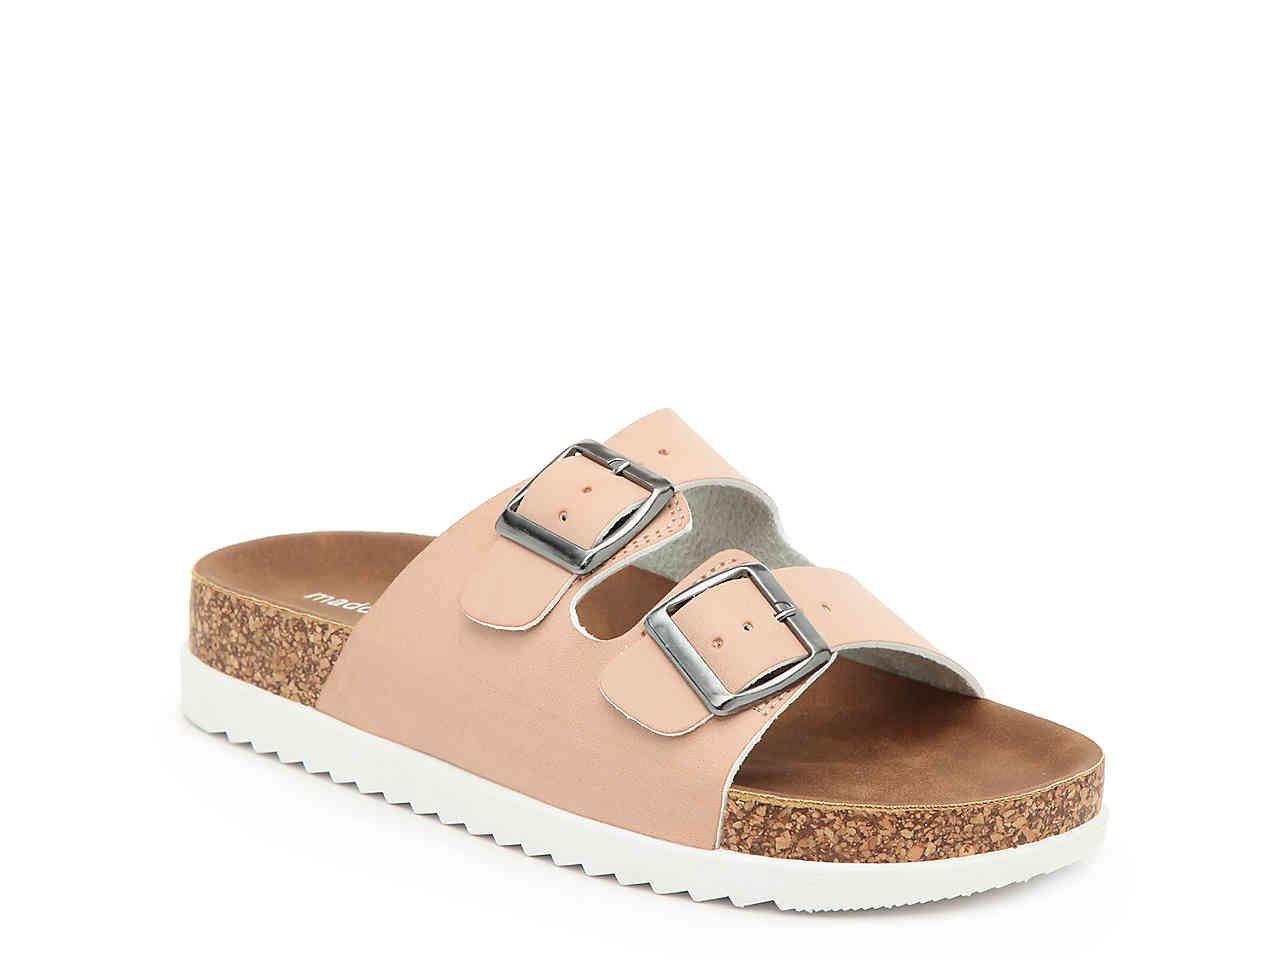 Madden Girl Goldie Sandal Women's Shoes | DSW